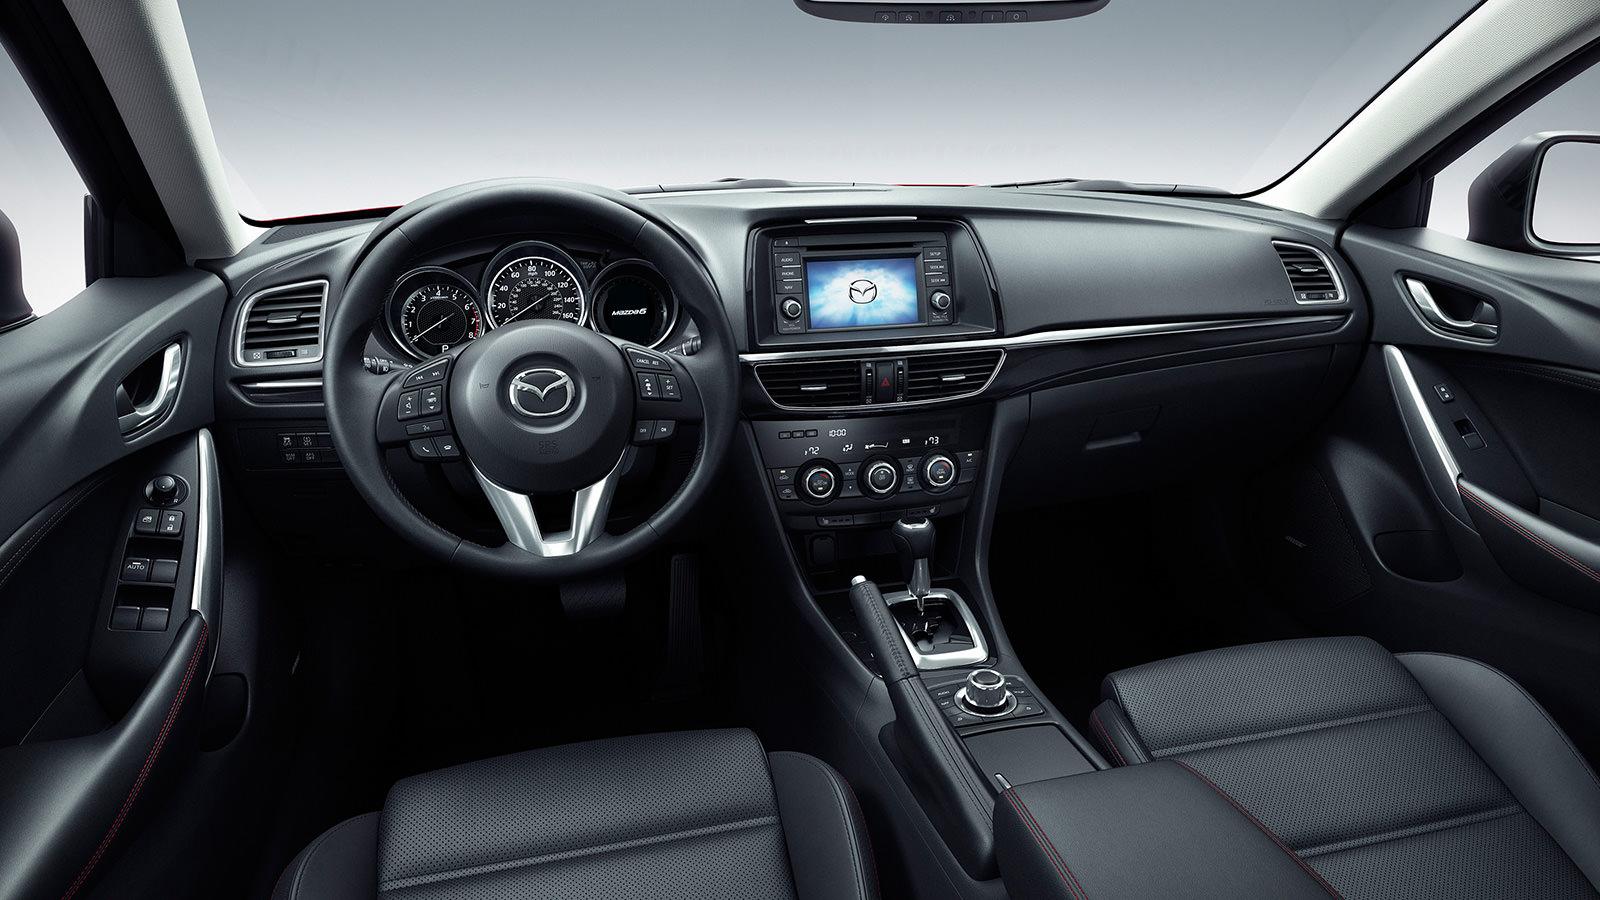 Top 10 Car Interiors Under $35,000